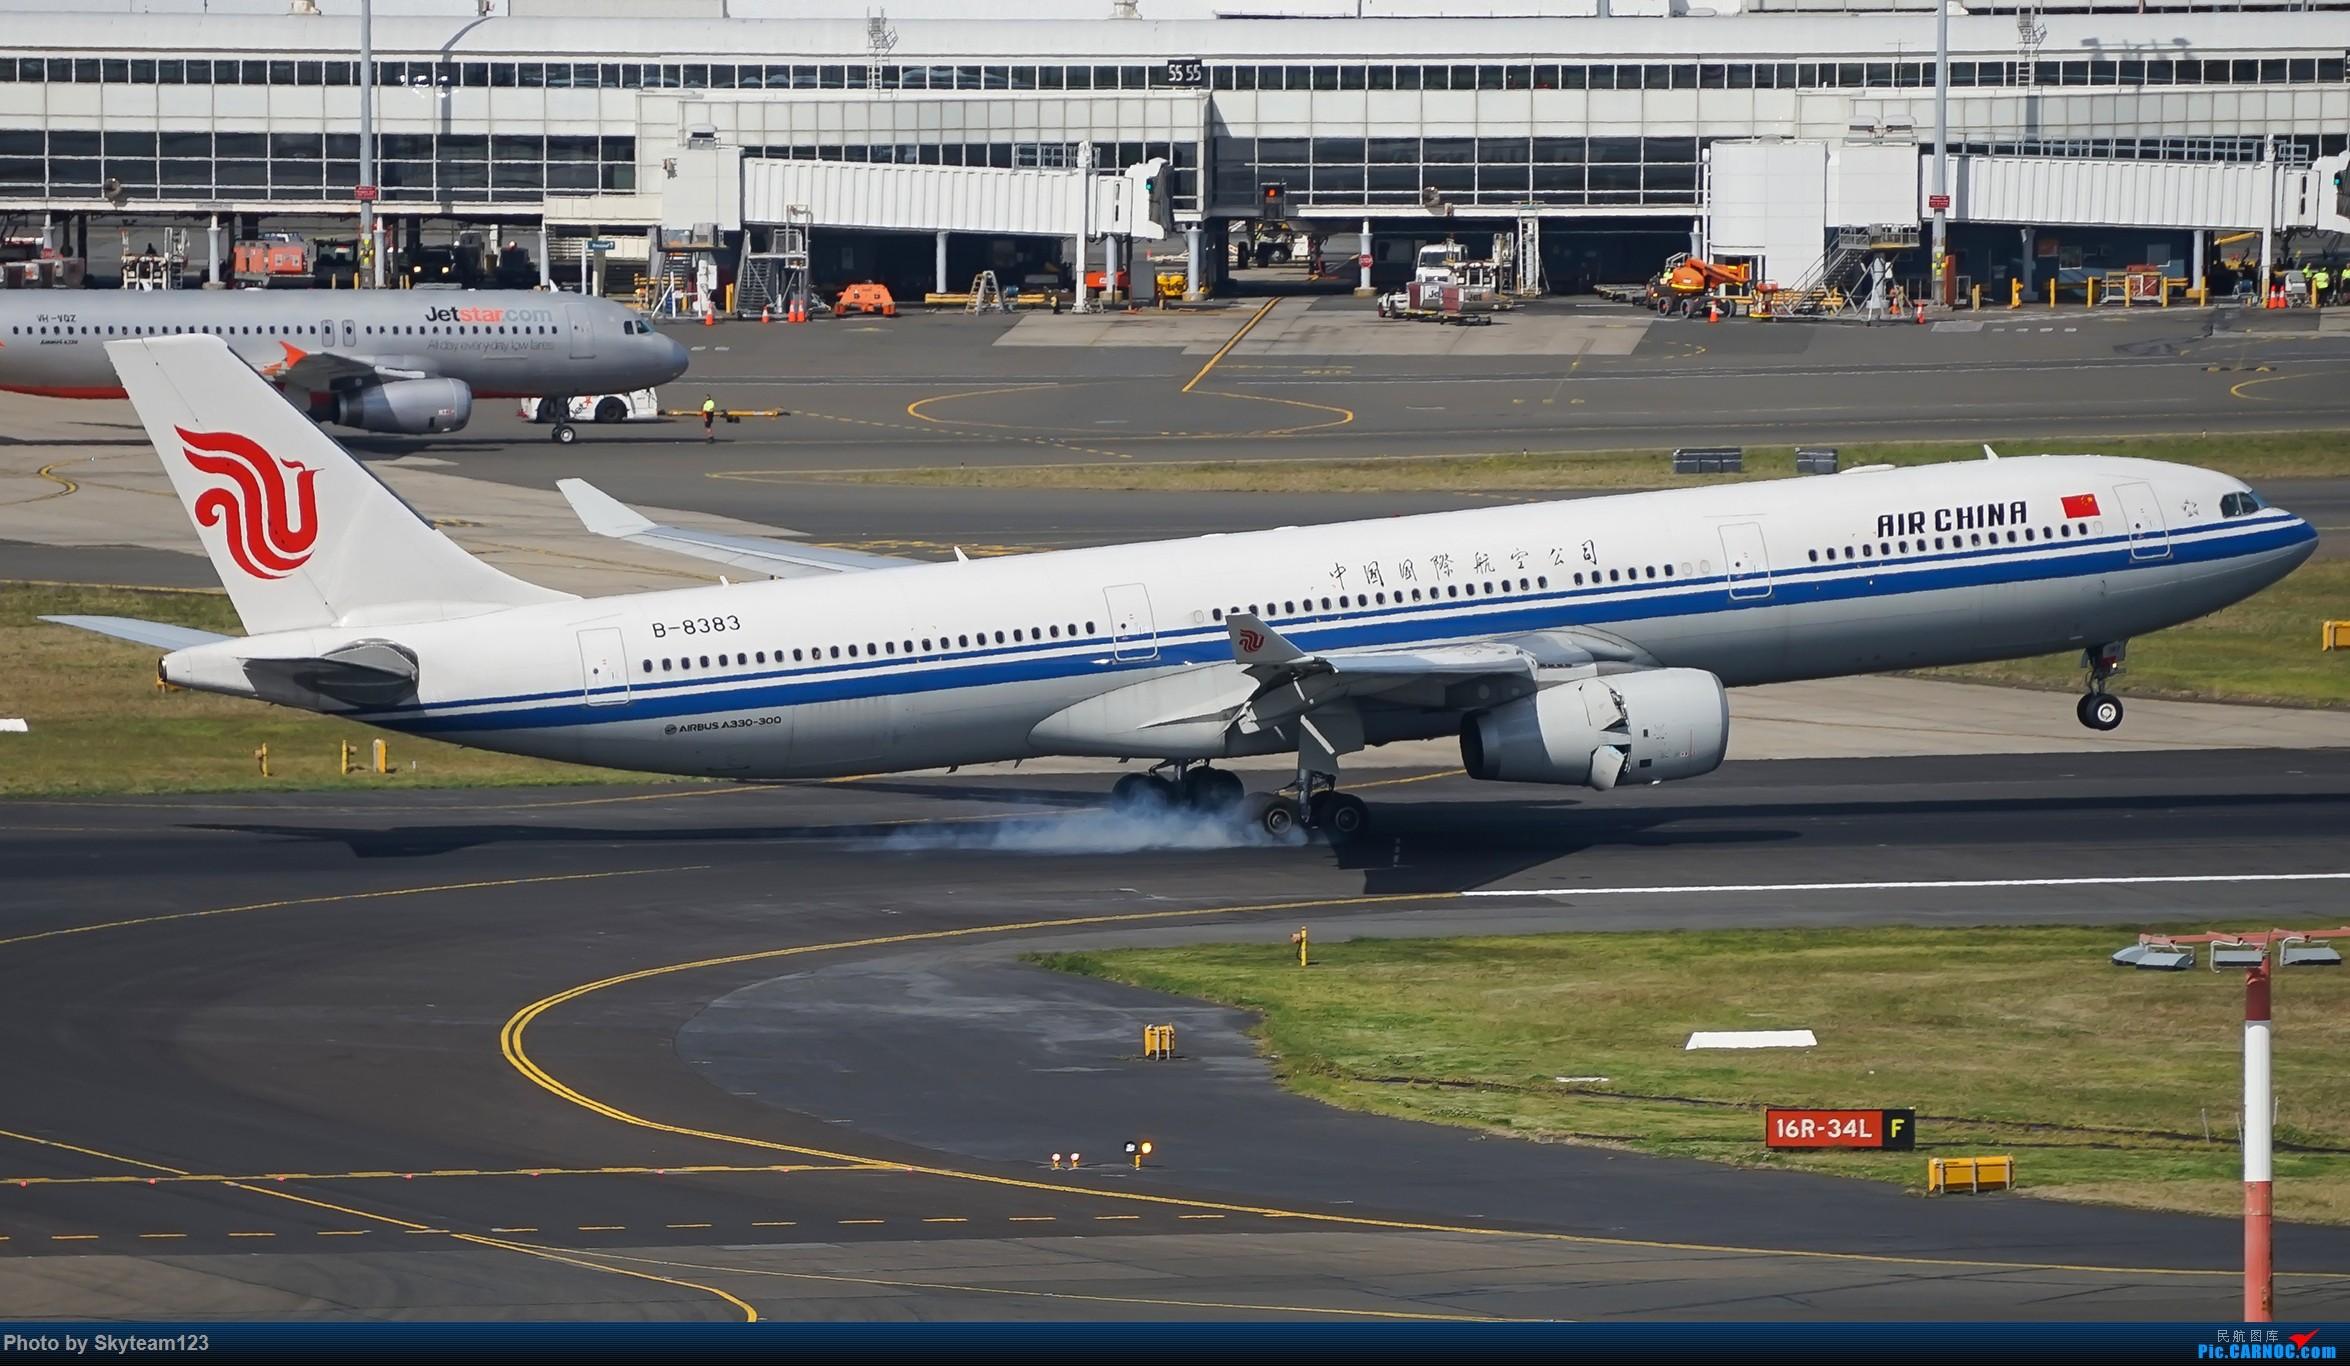 Re:[原创][SYD] 假期拍机小结 解锁16R跑道头拍机位 & 停车楼拍机作业 【全宽体】 AIRBUS A330-300 B-8383 澳大利亚悉尼金斯福德·史密斯机场